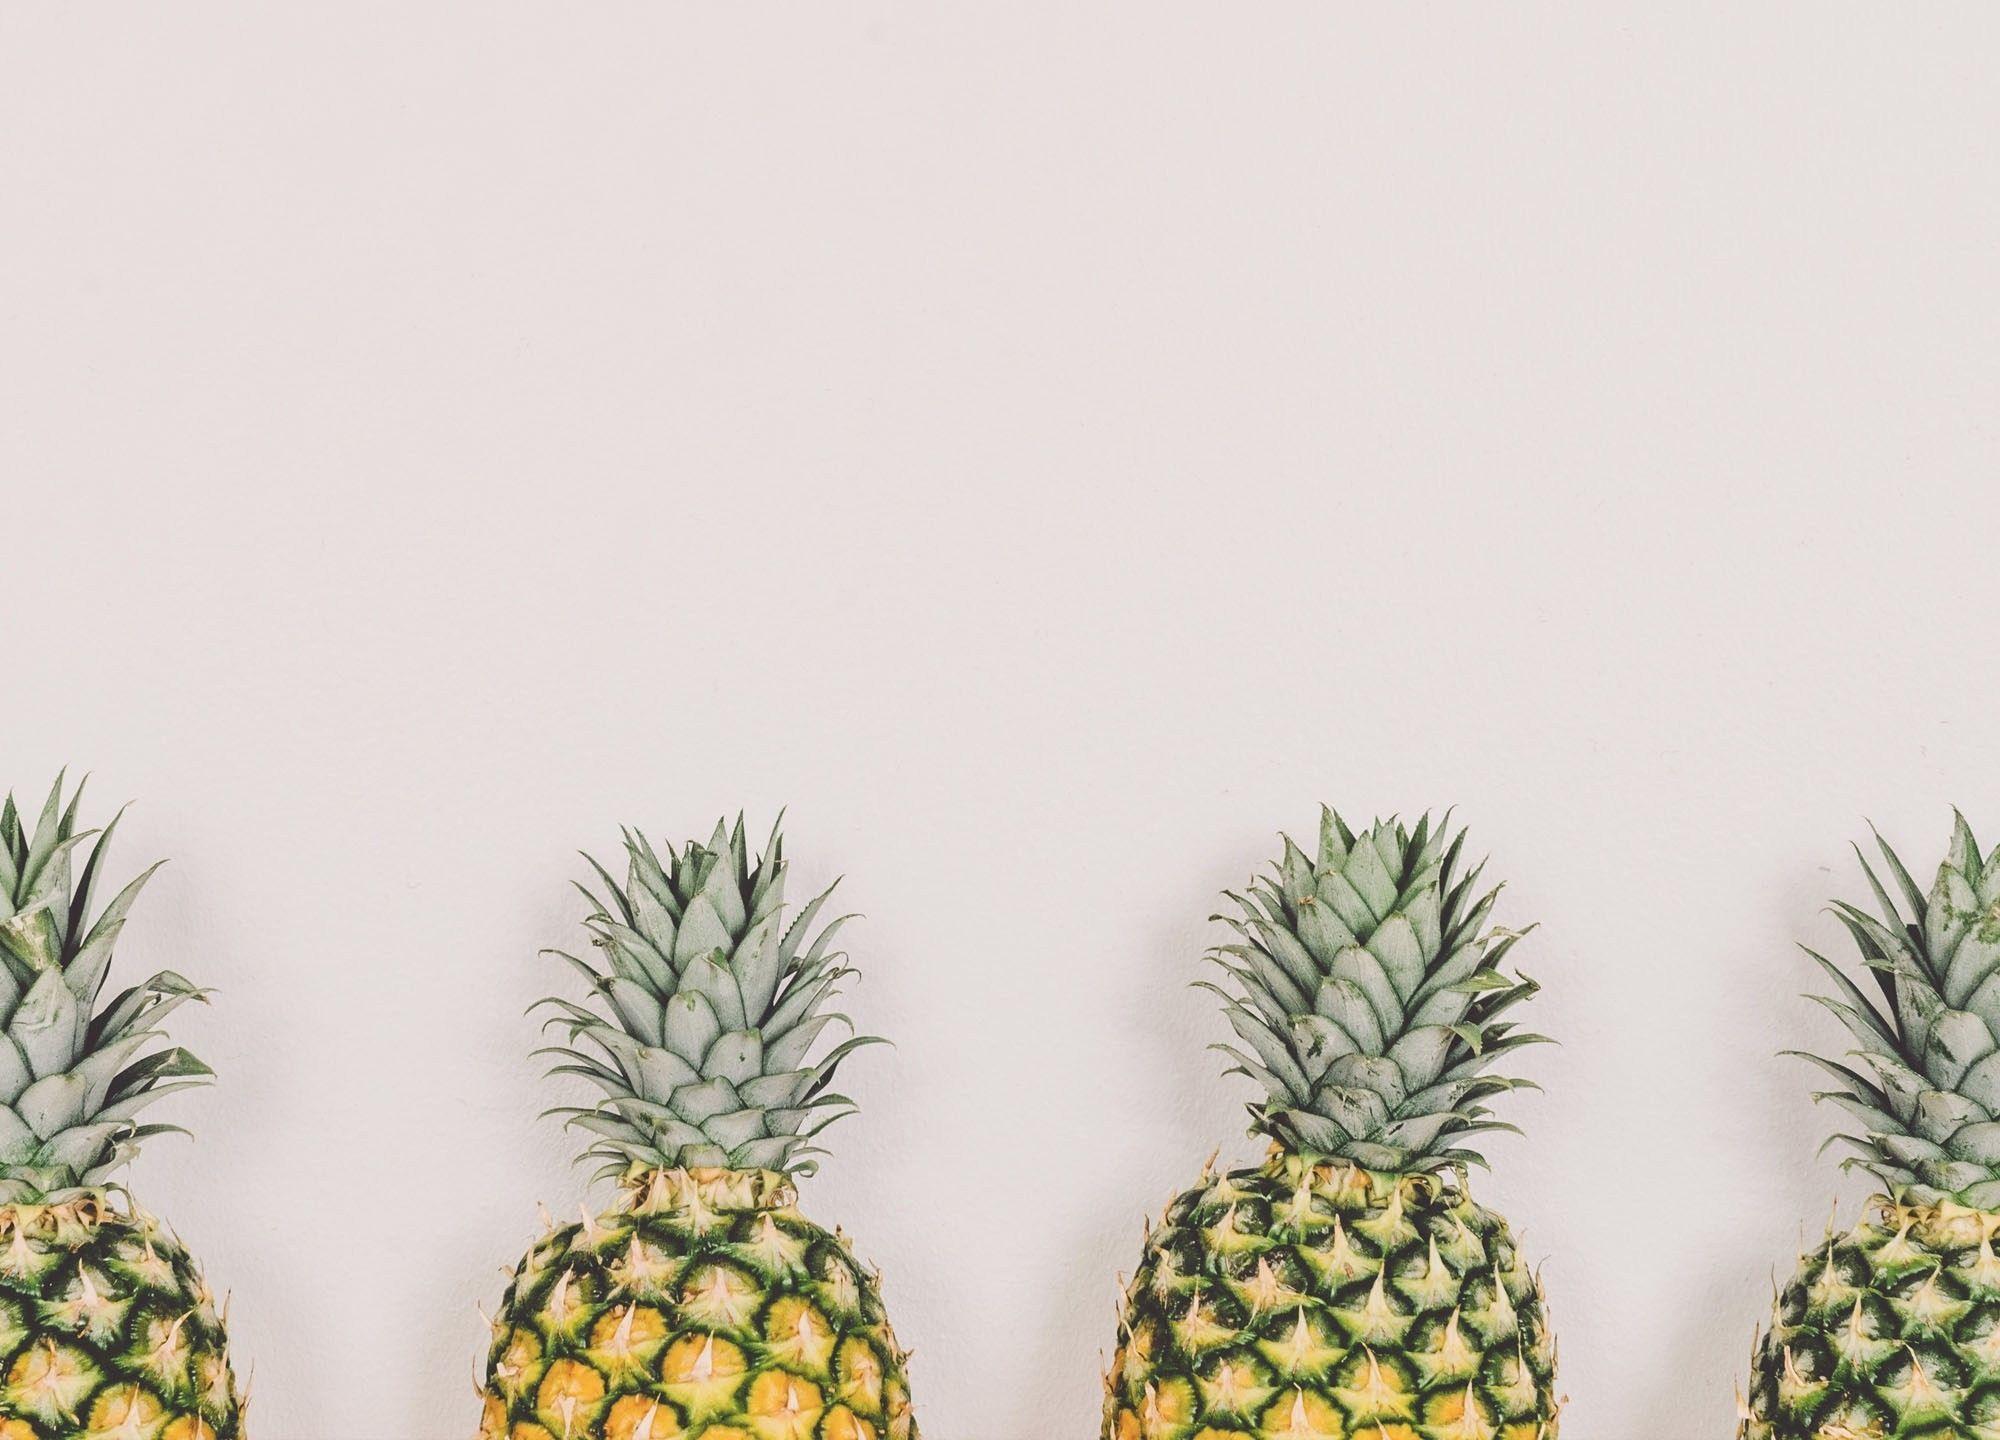 Pineapple Desktop Wallpapers Top Free Pineapple Desktop Backgrounds Wallpaperaccess In 2020 Pregnant Diet Trim Healthy Mama Pineapple Wallpaper